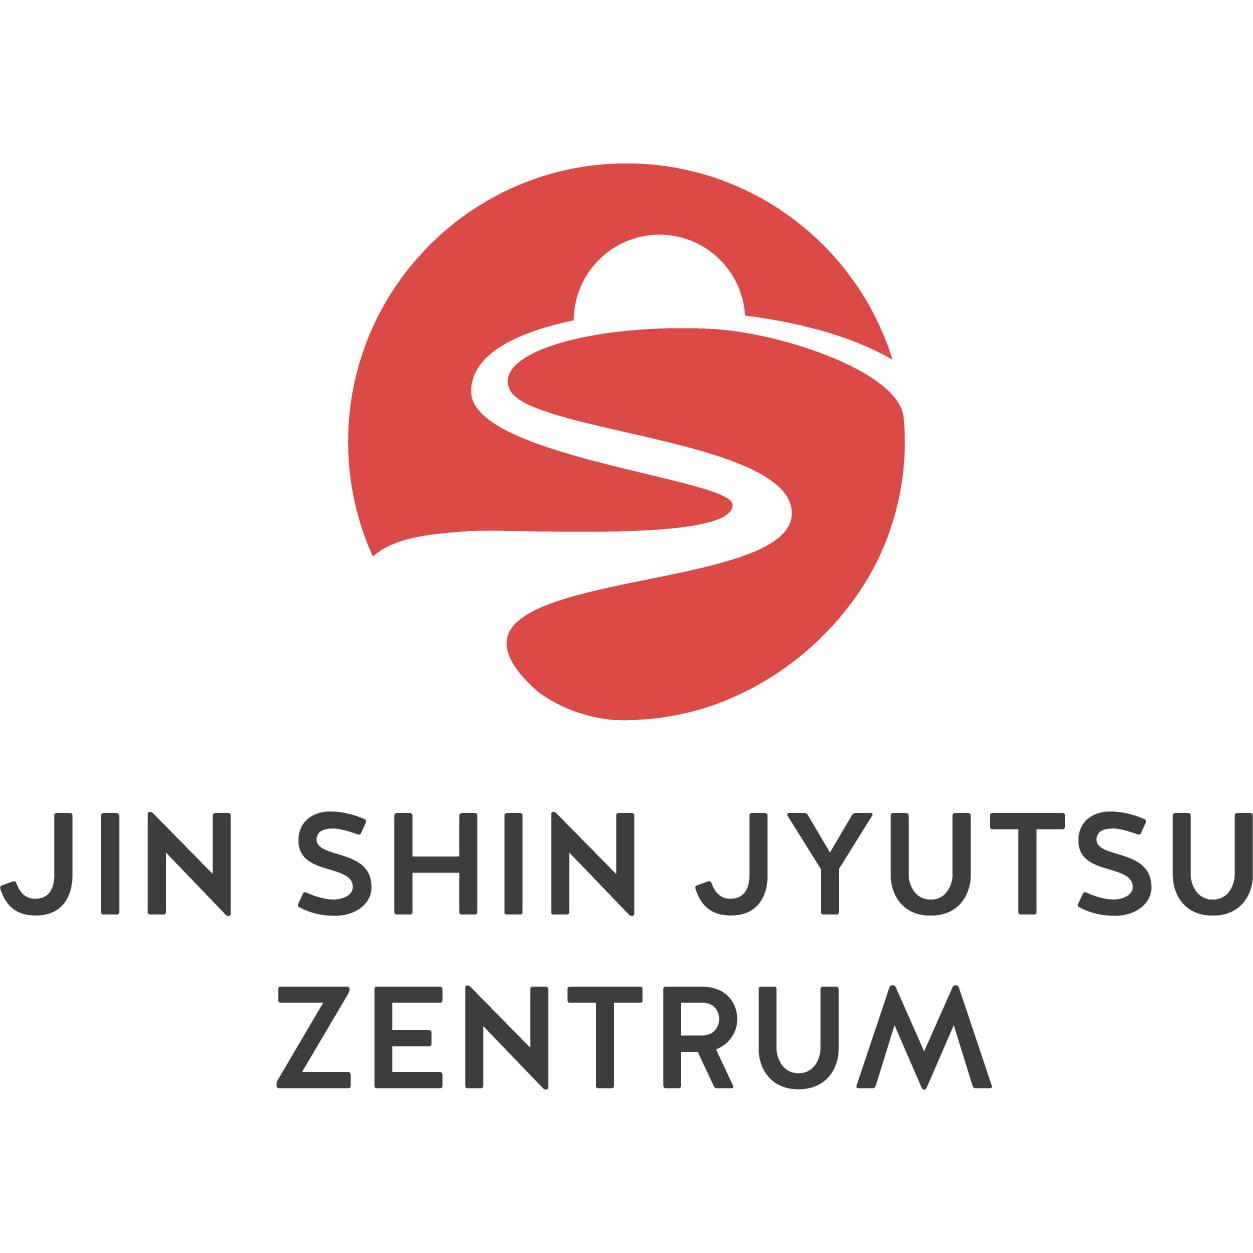 JSJ Zentrum